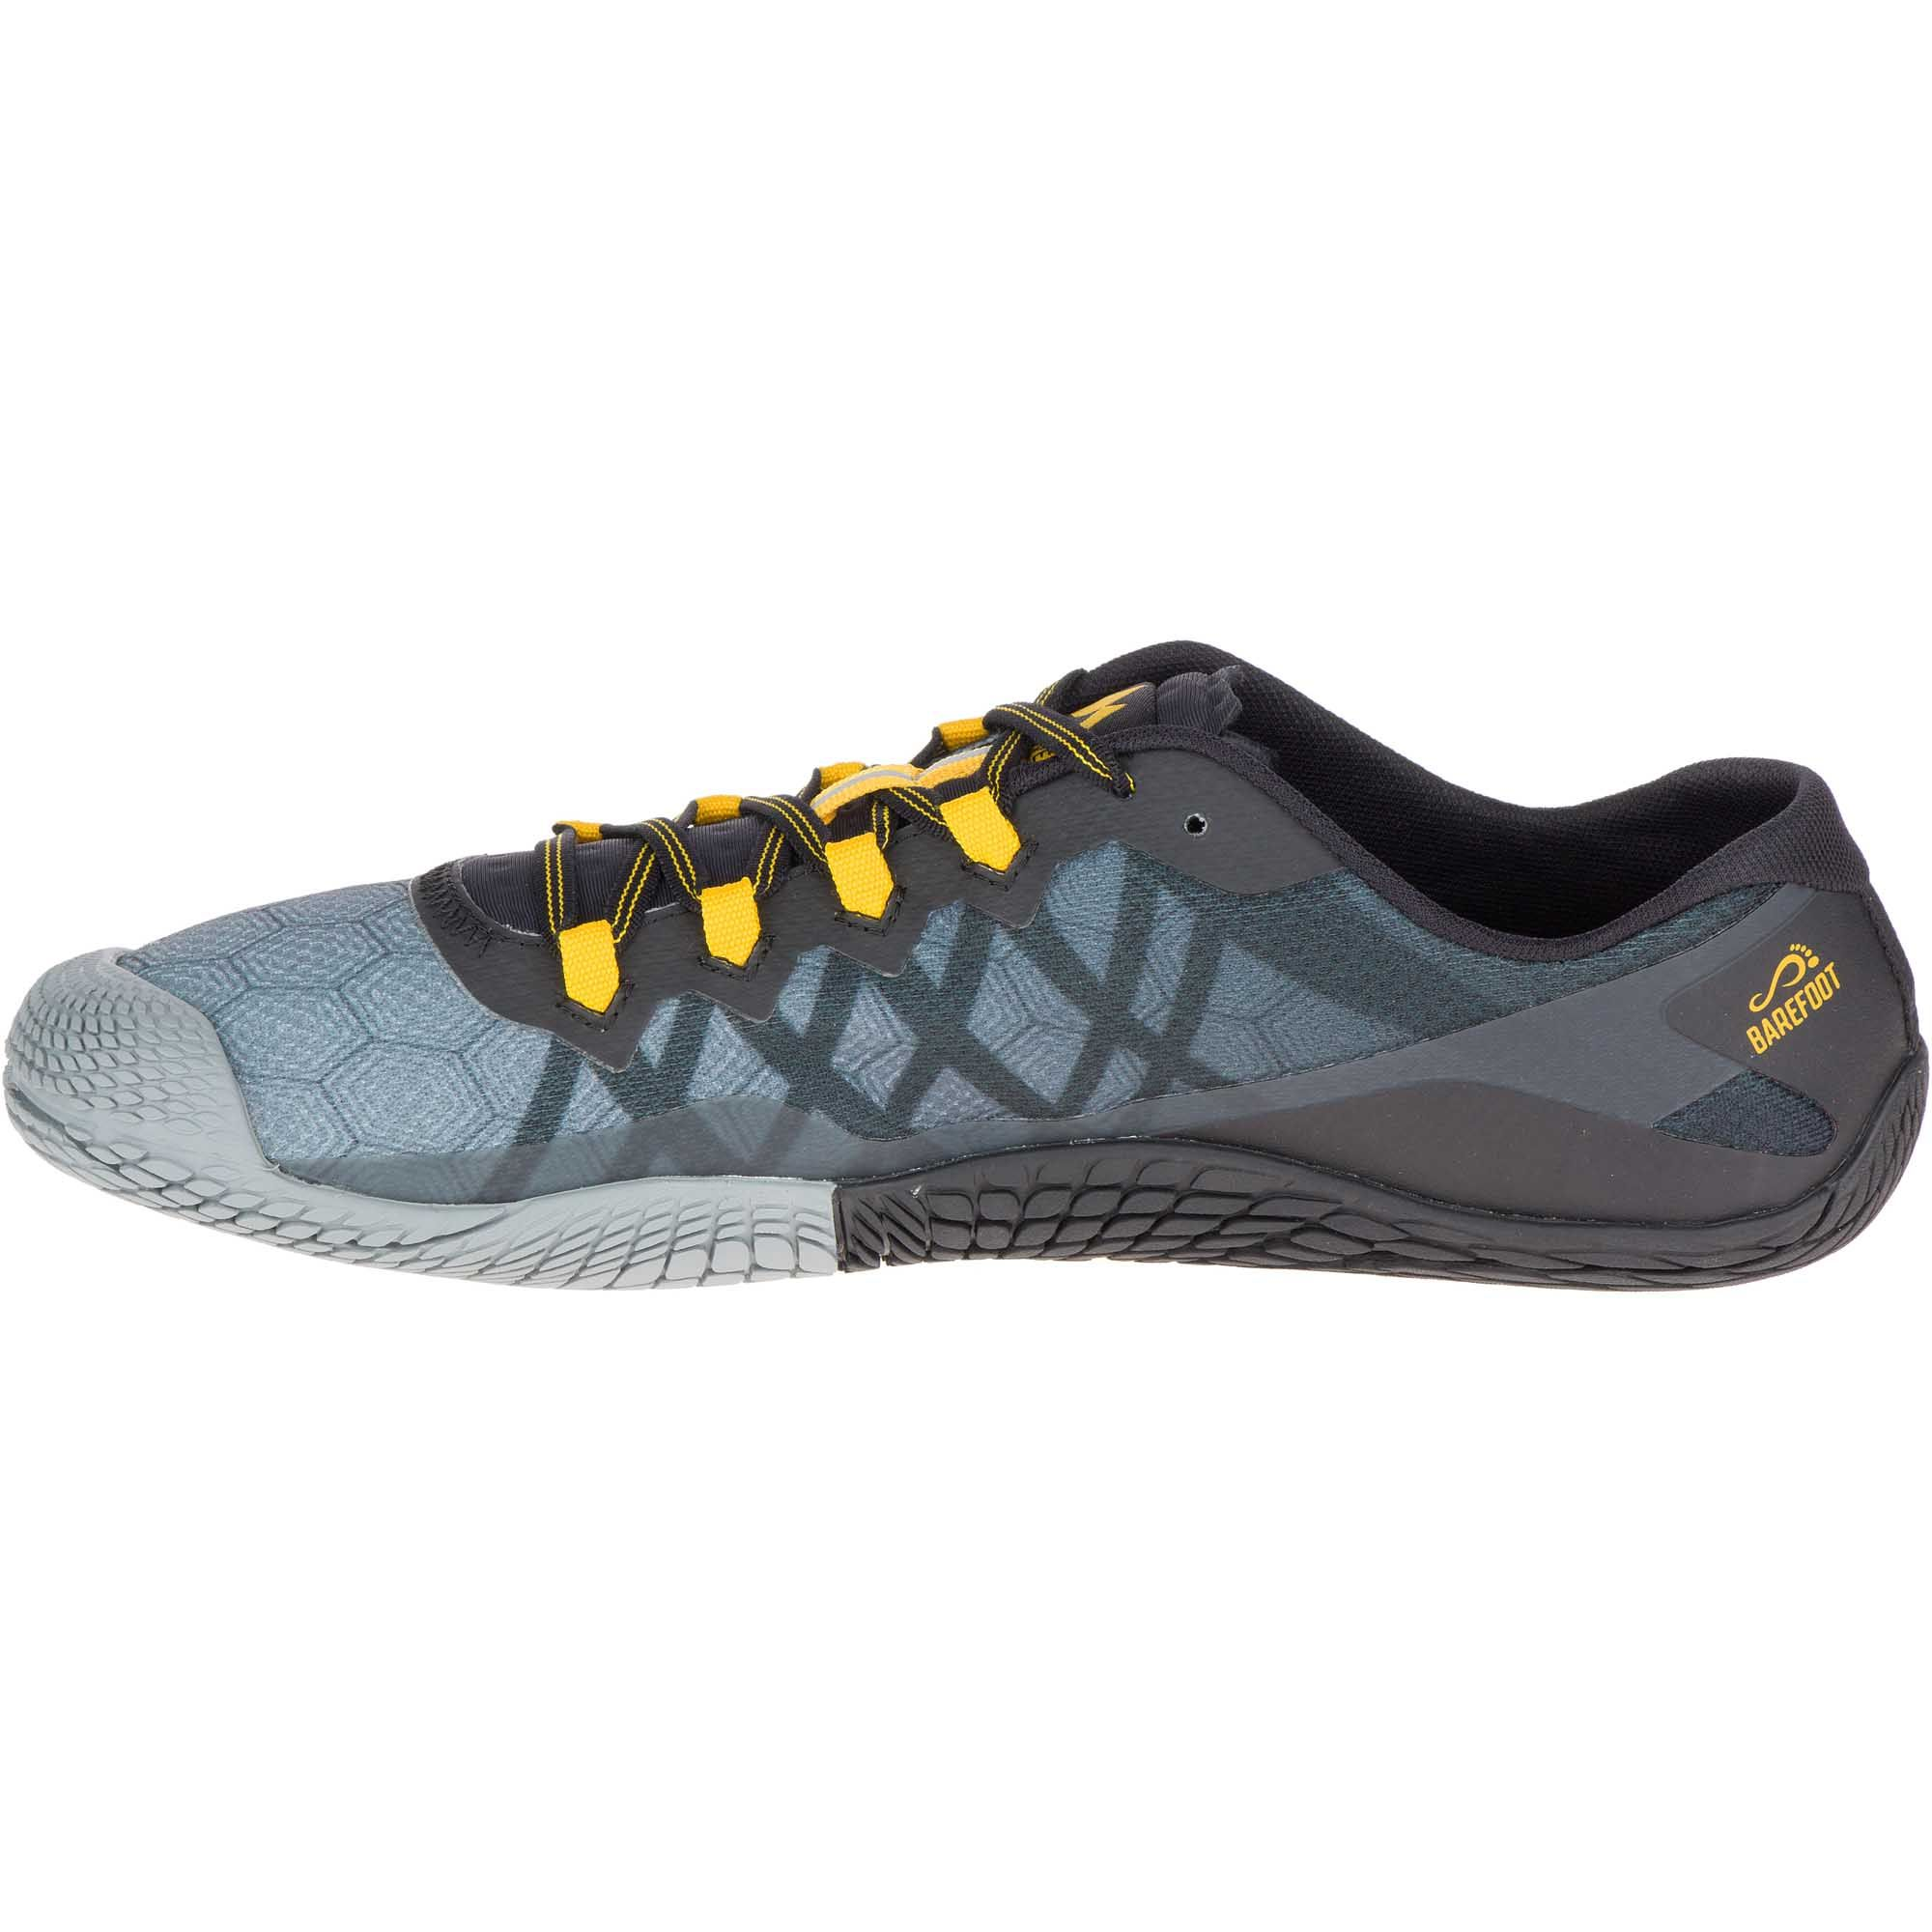 Merrell Toe Shoes